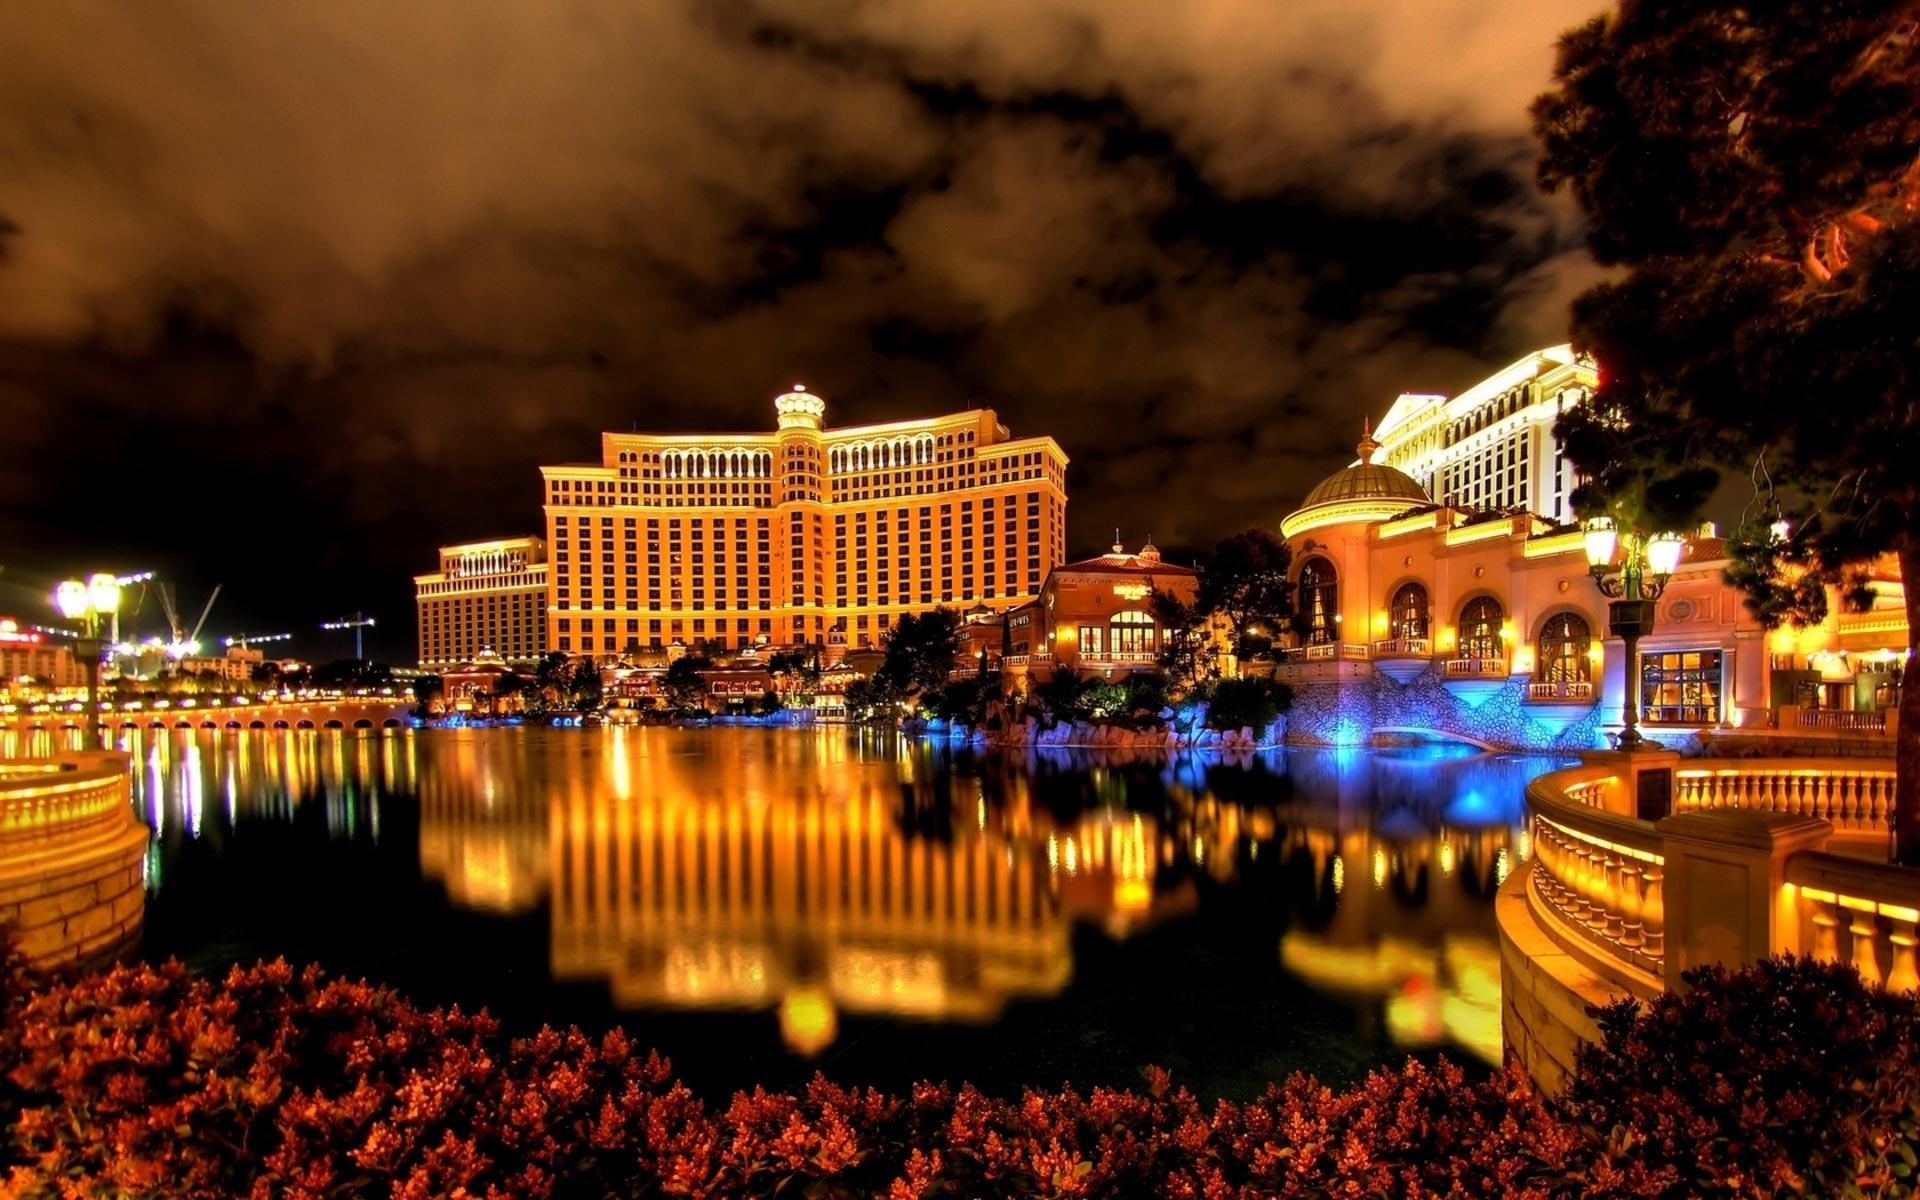 72 Las Vegas Hd Wallpaper On Wallpapersafari